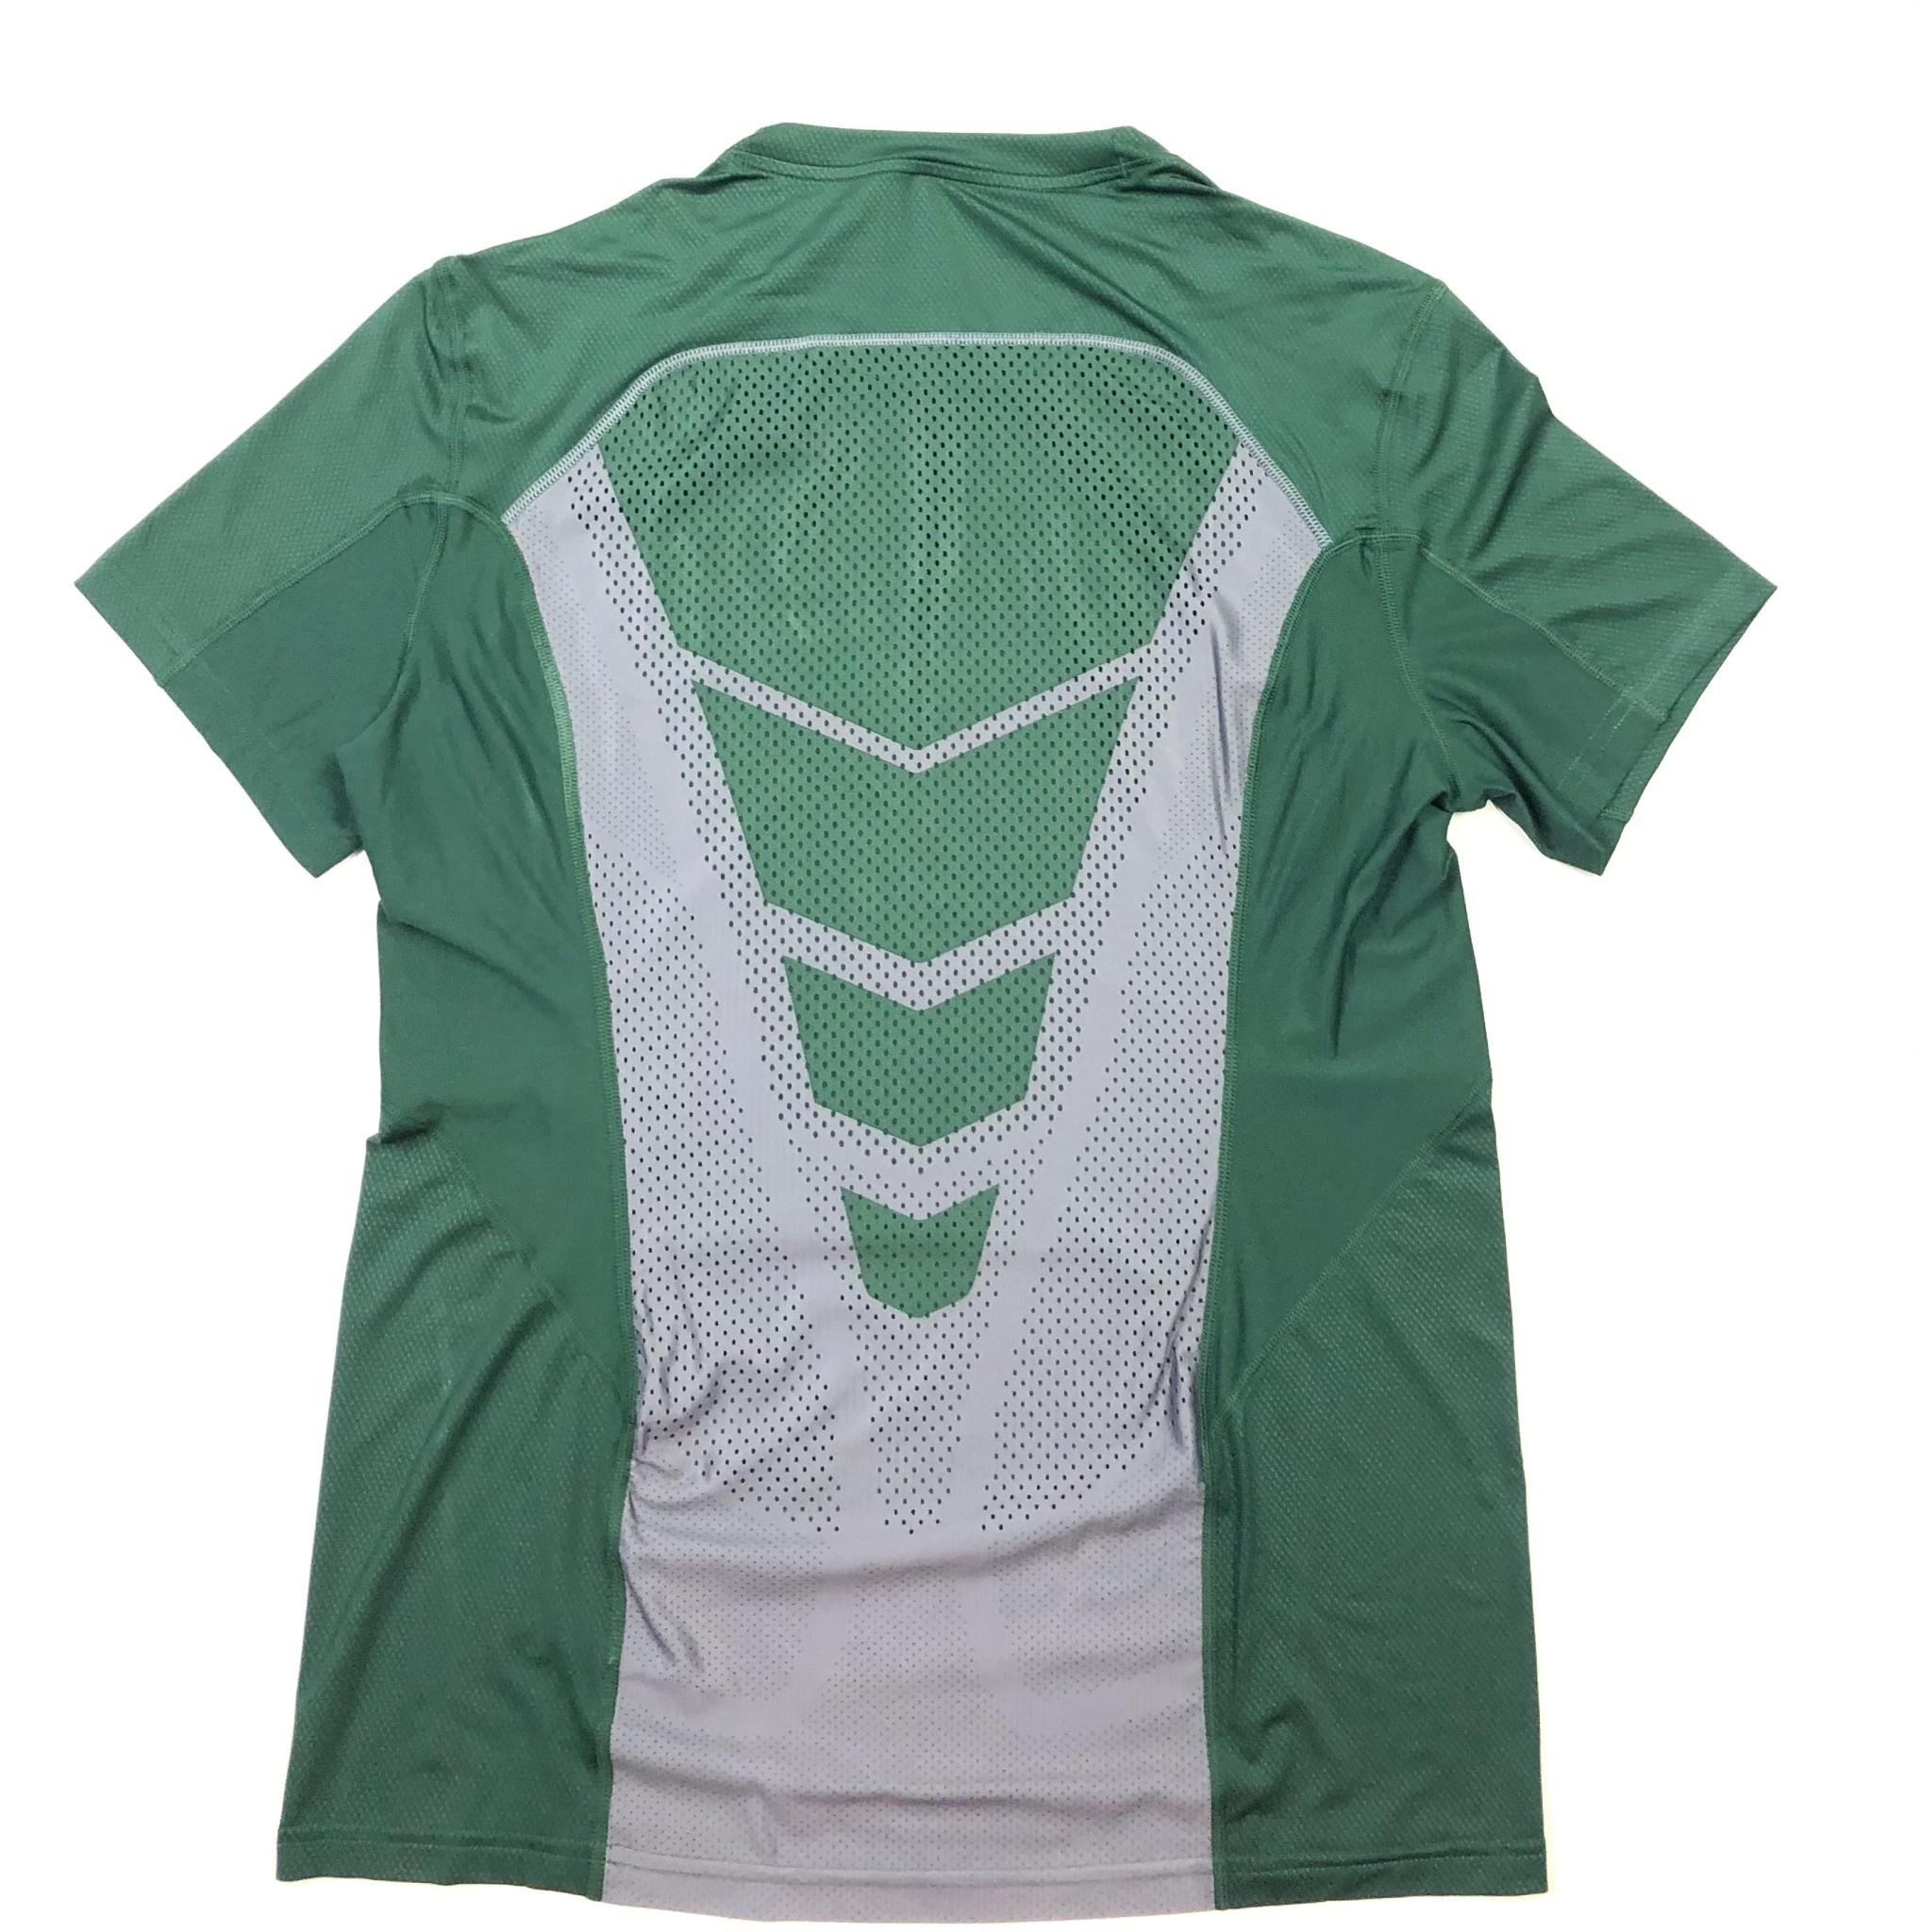 Nike T: Nike Hypercool Dri-fit SS- Green/Gray